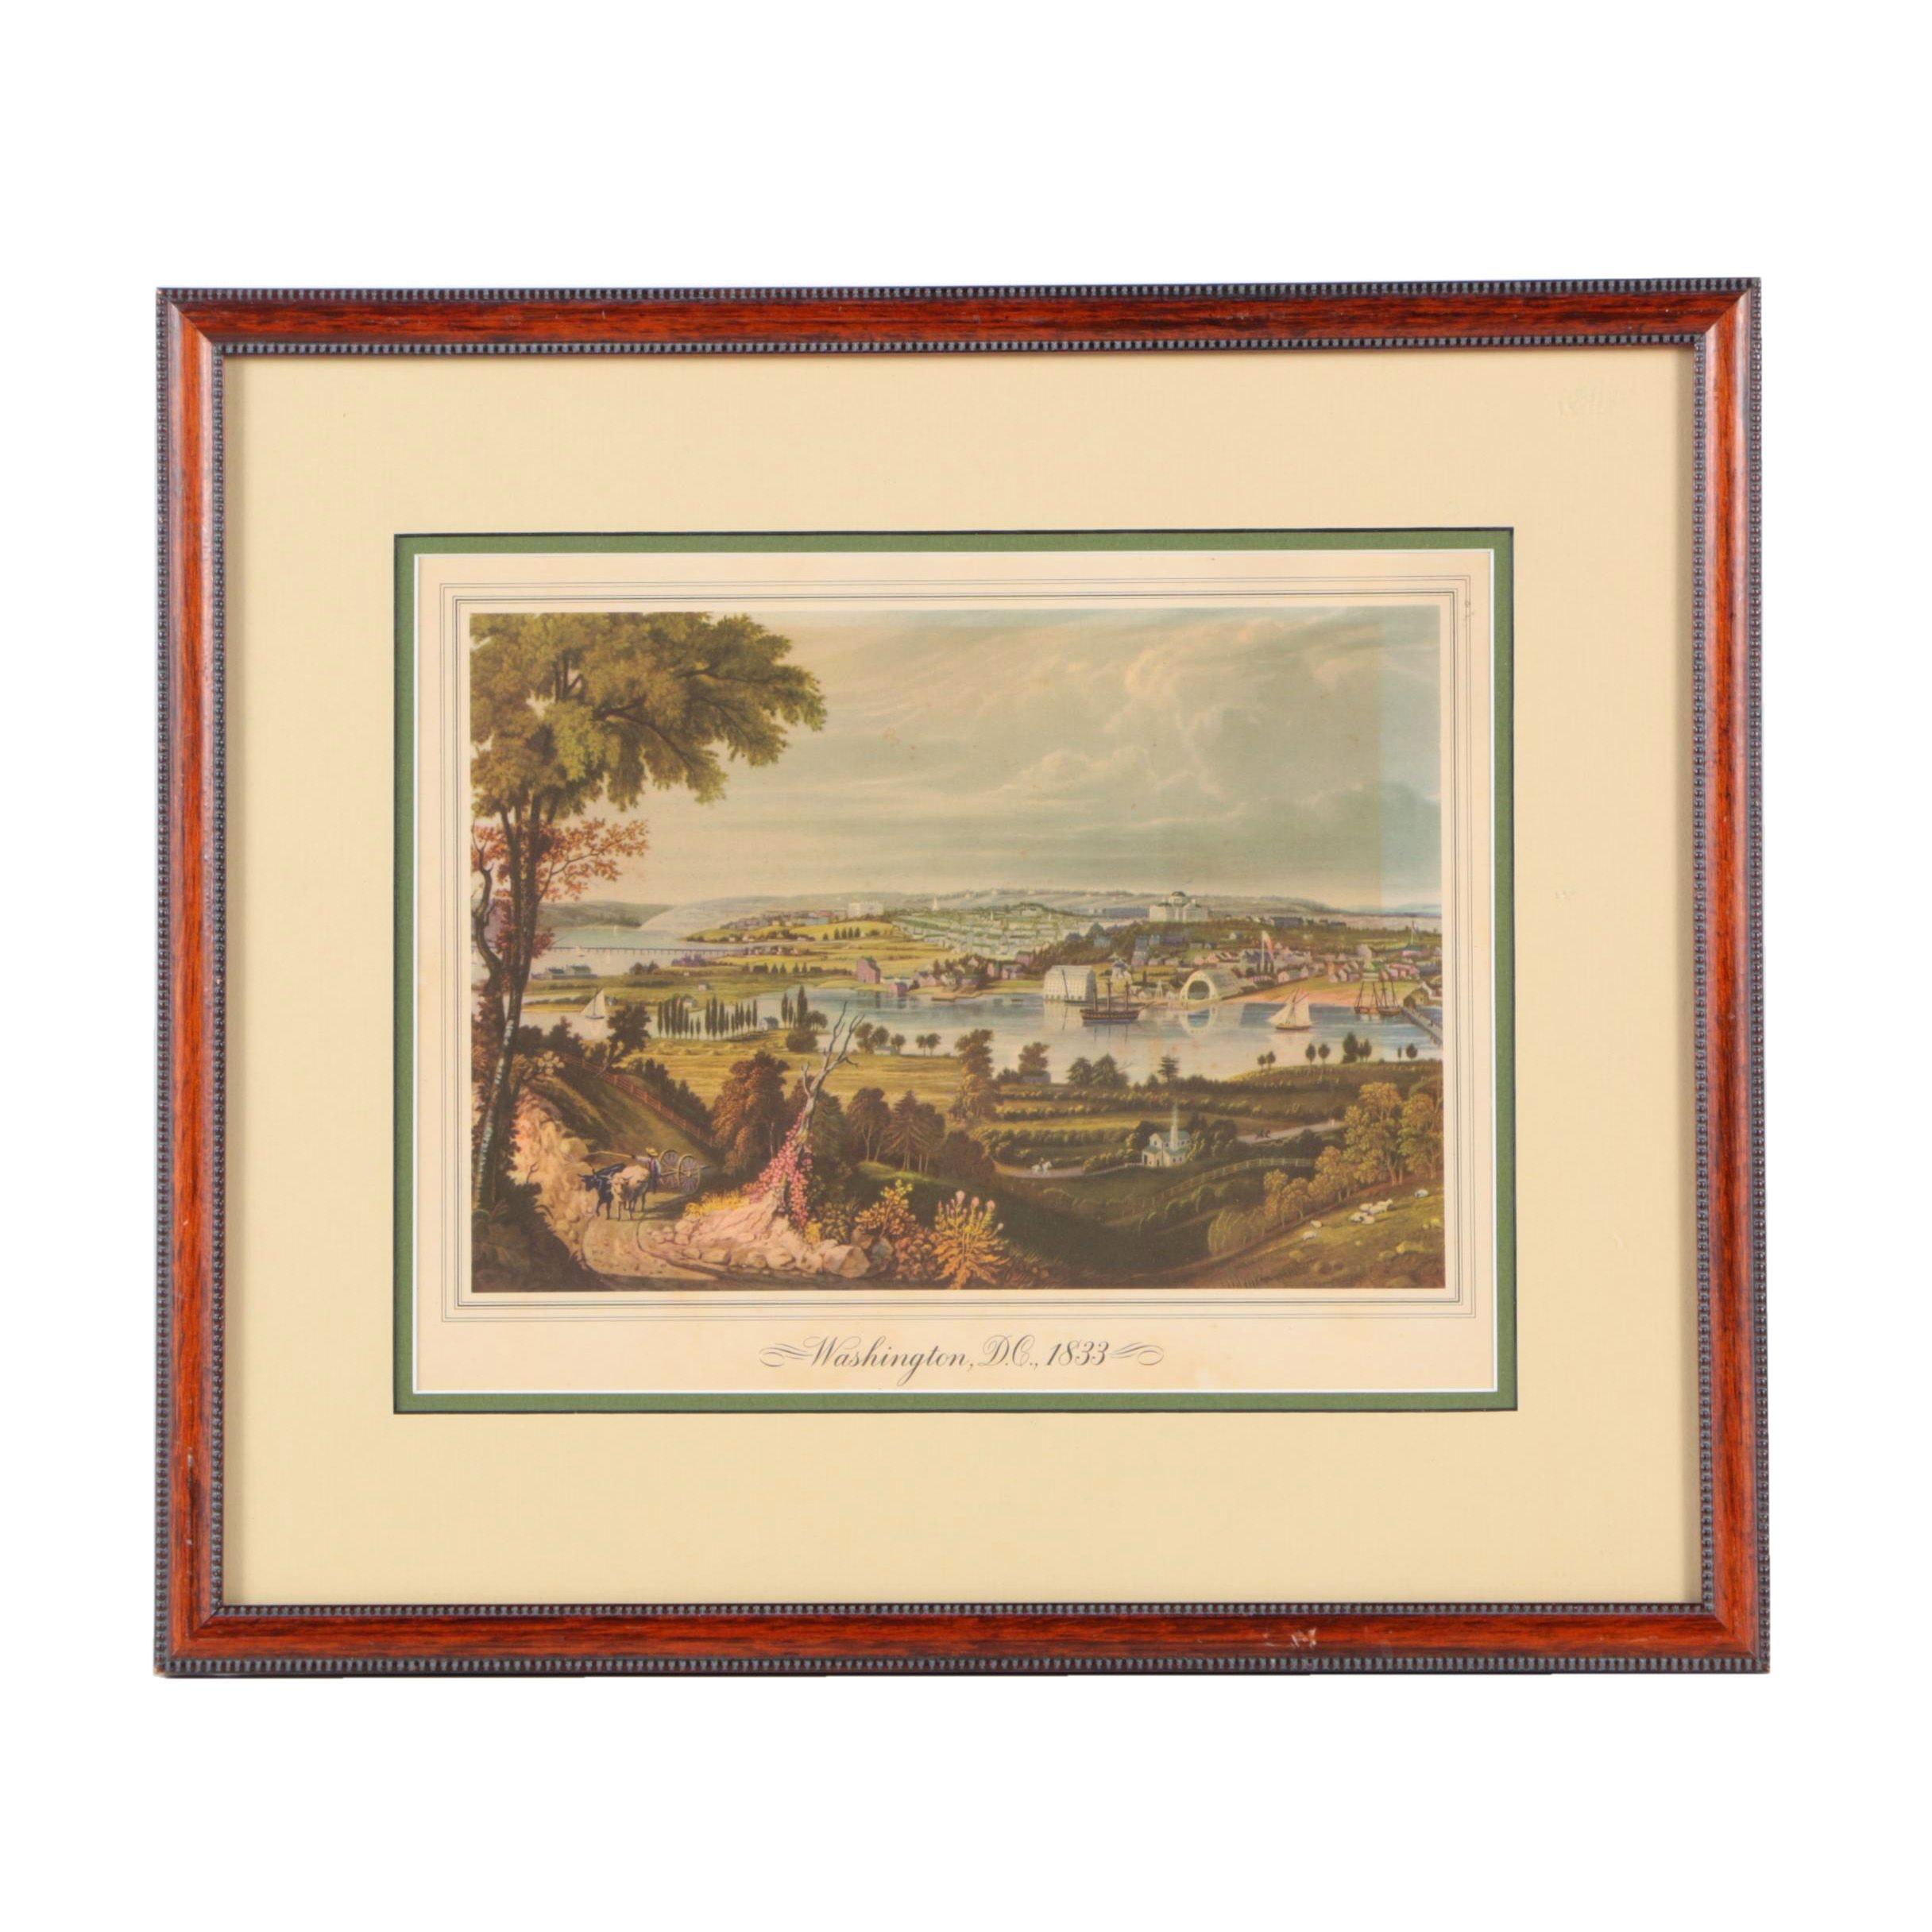 "Offset Lithograph on Paper ""Washington, D.C.,1833"""